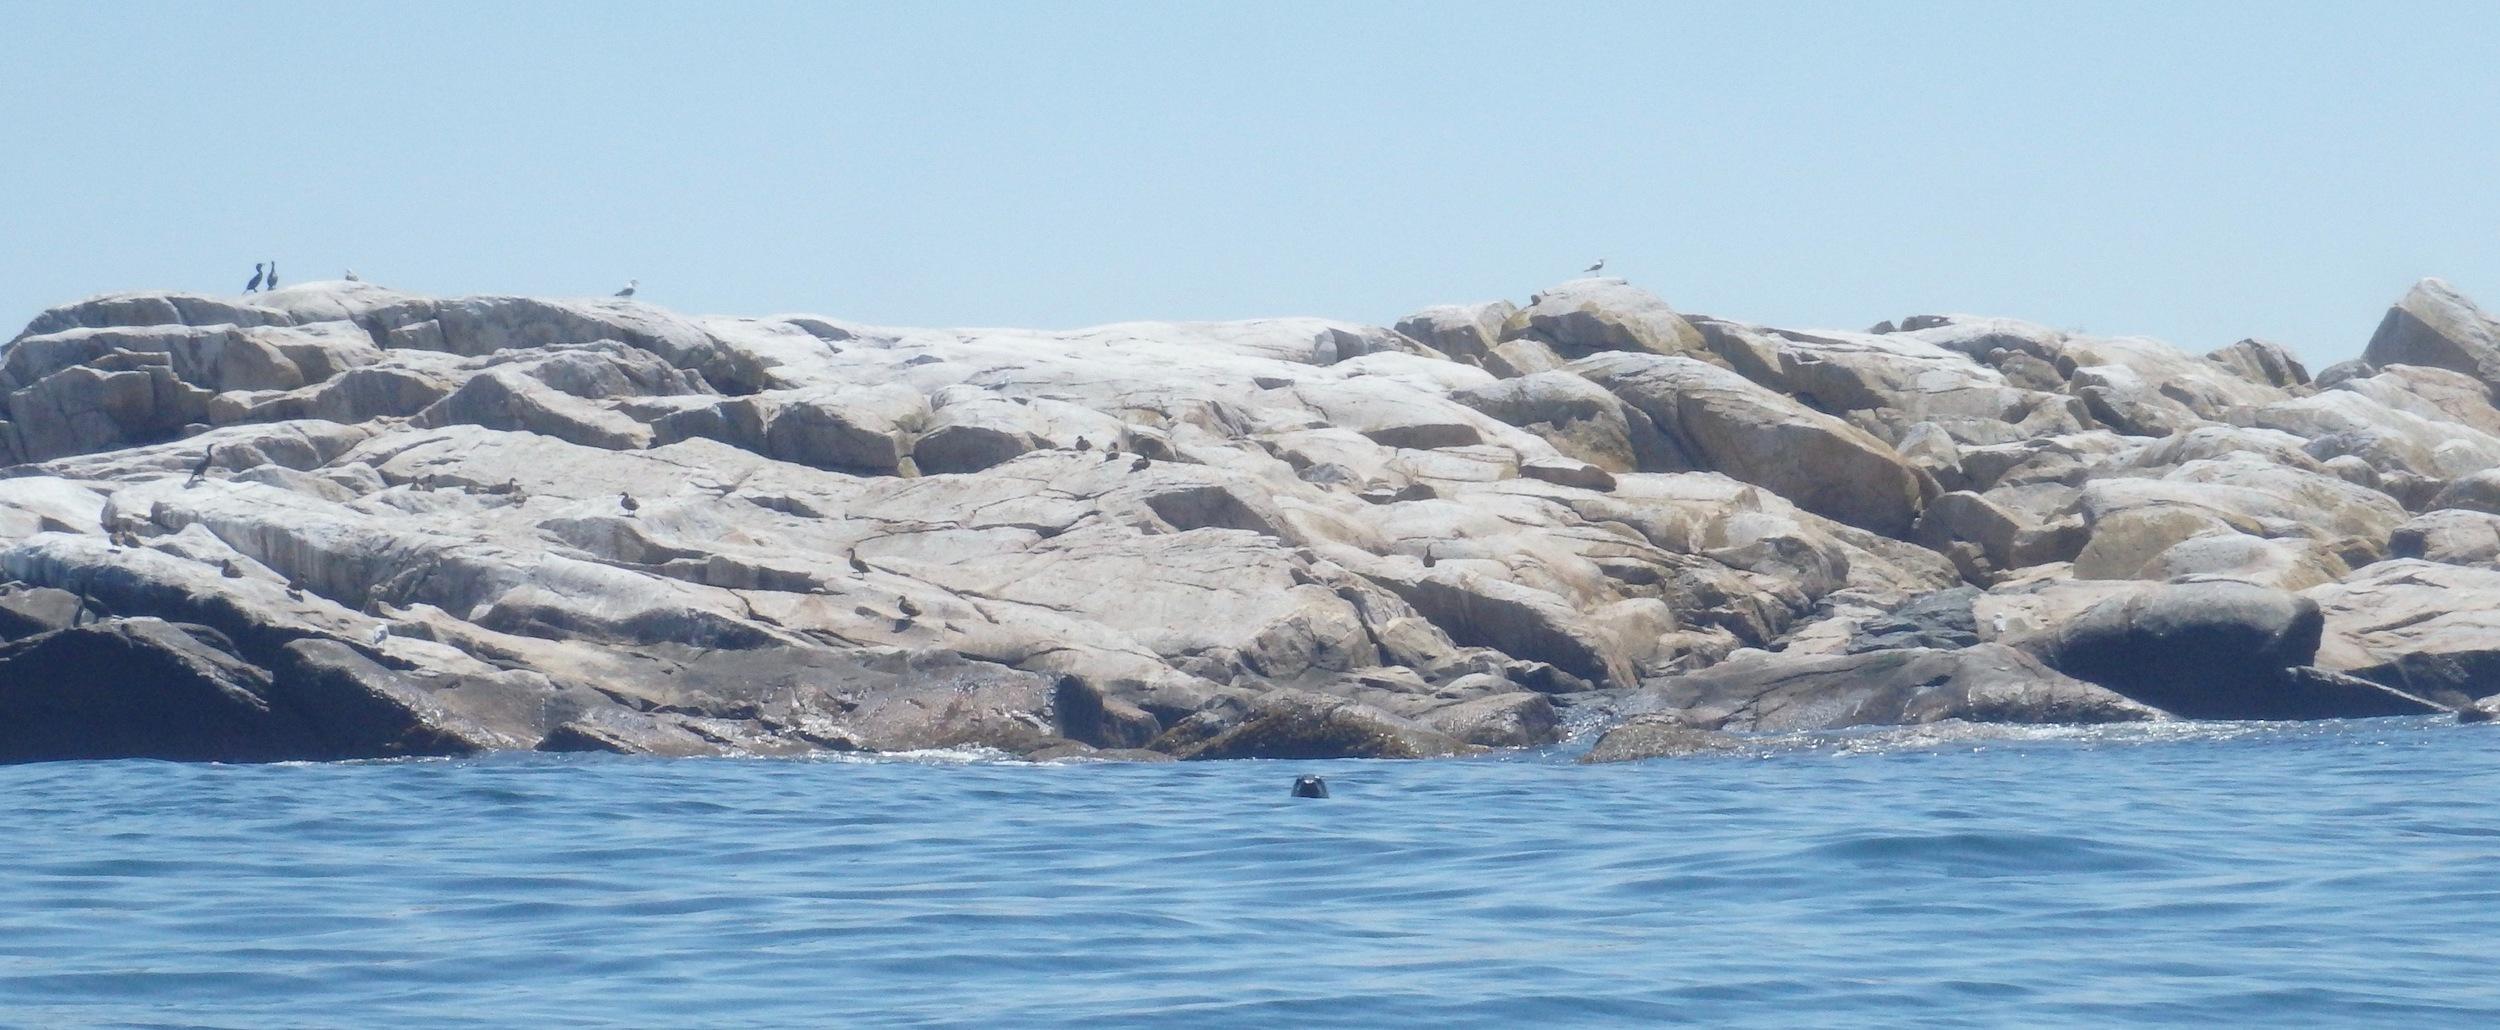 Seal off Matinicus Rock